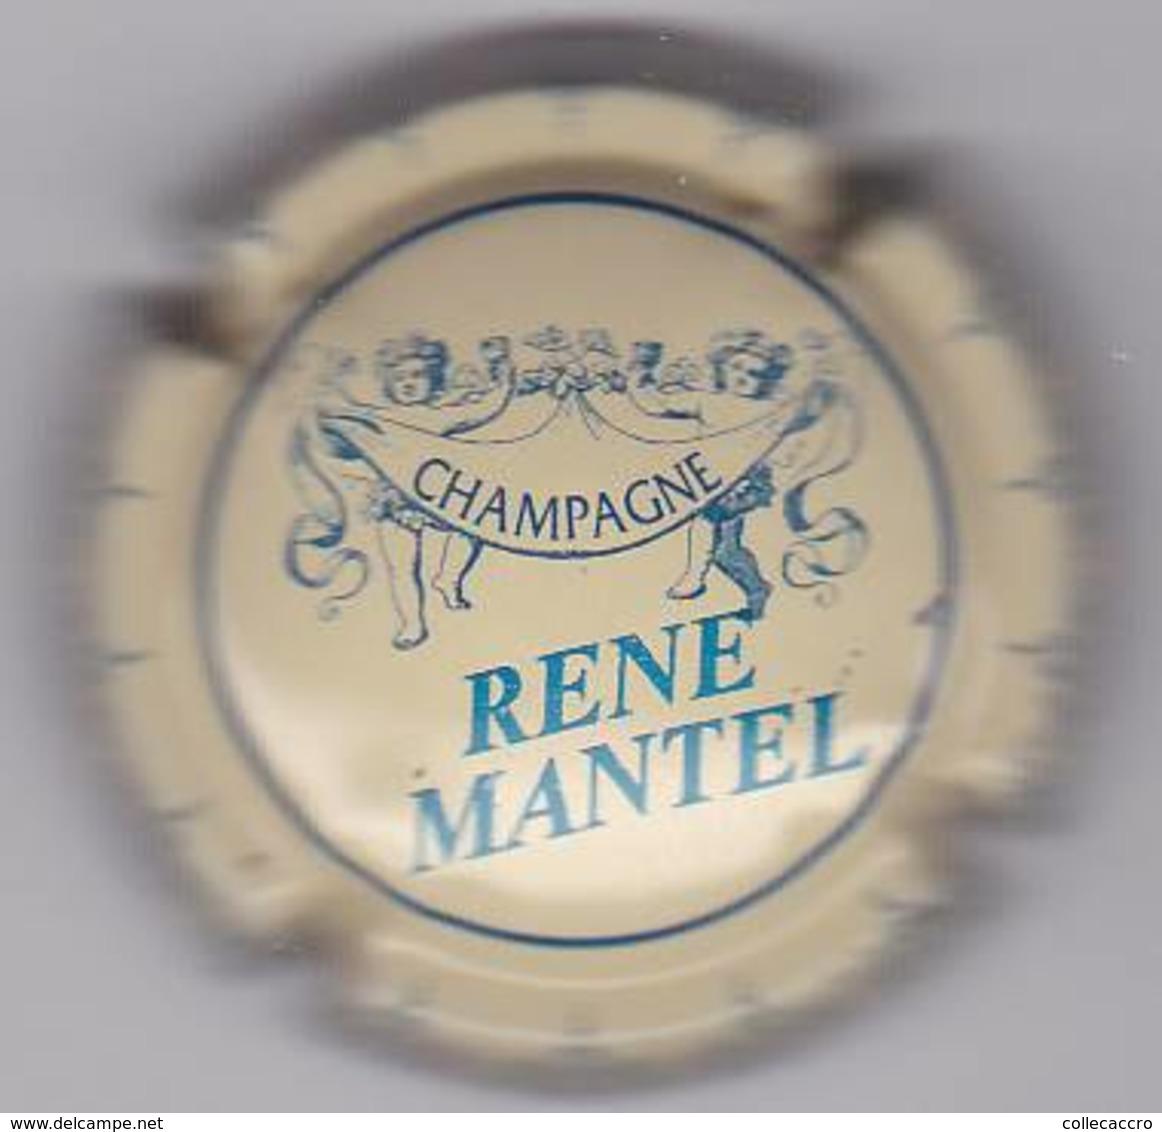 MANTEL RENE NOUVELLE - Champagne